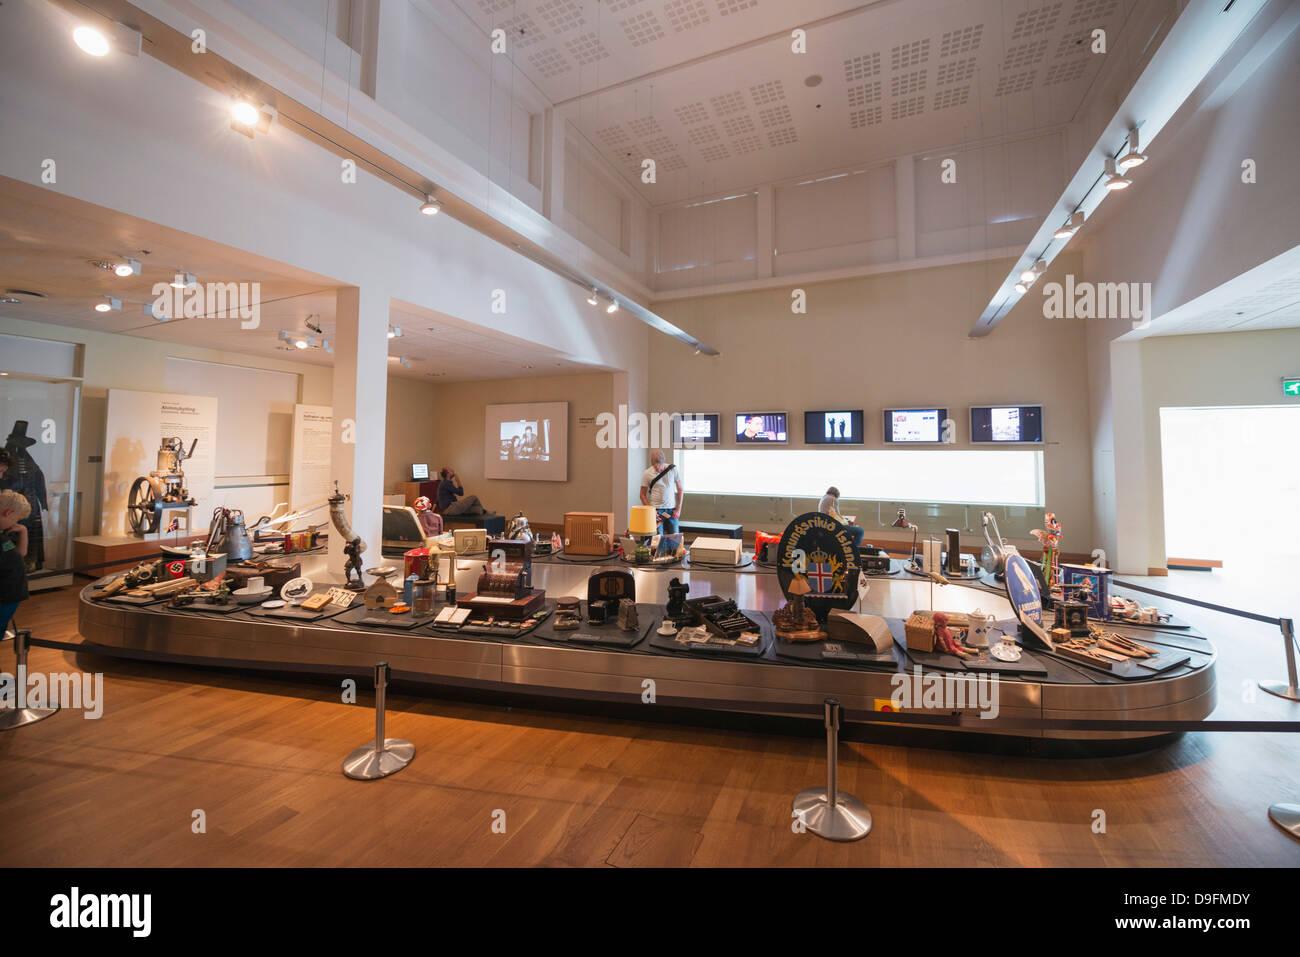 Museo Nazionale, Reykjavik, Islanda, regioni polari Immagini Stock